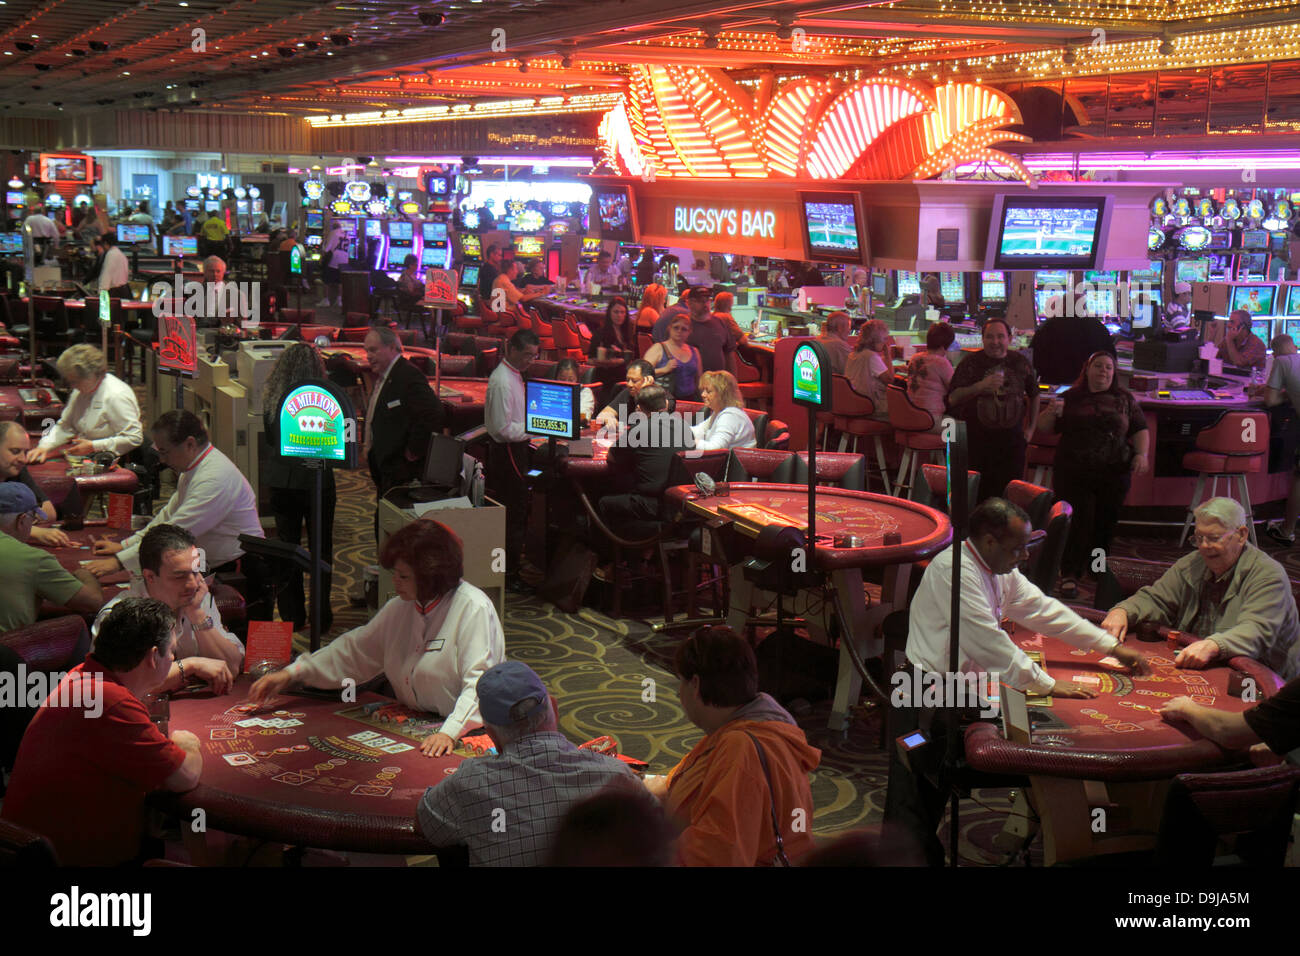 Nevada Las Vegas The Strip South Las Vegas Boulevard Flamingo Las Vegas Hotel and Casino gamblers gambling players - Stock Image